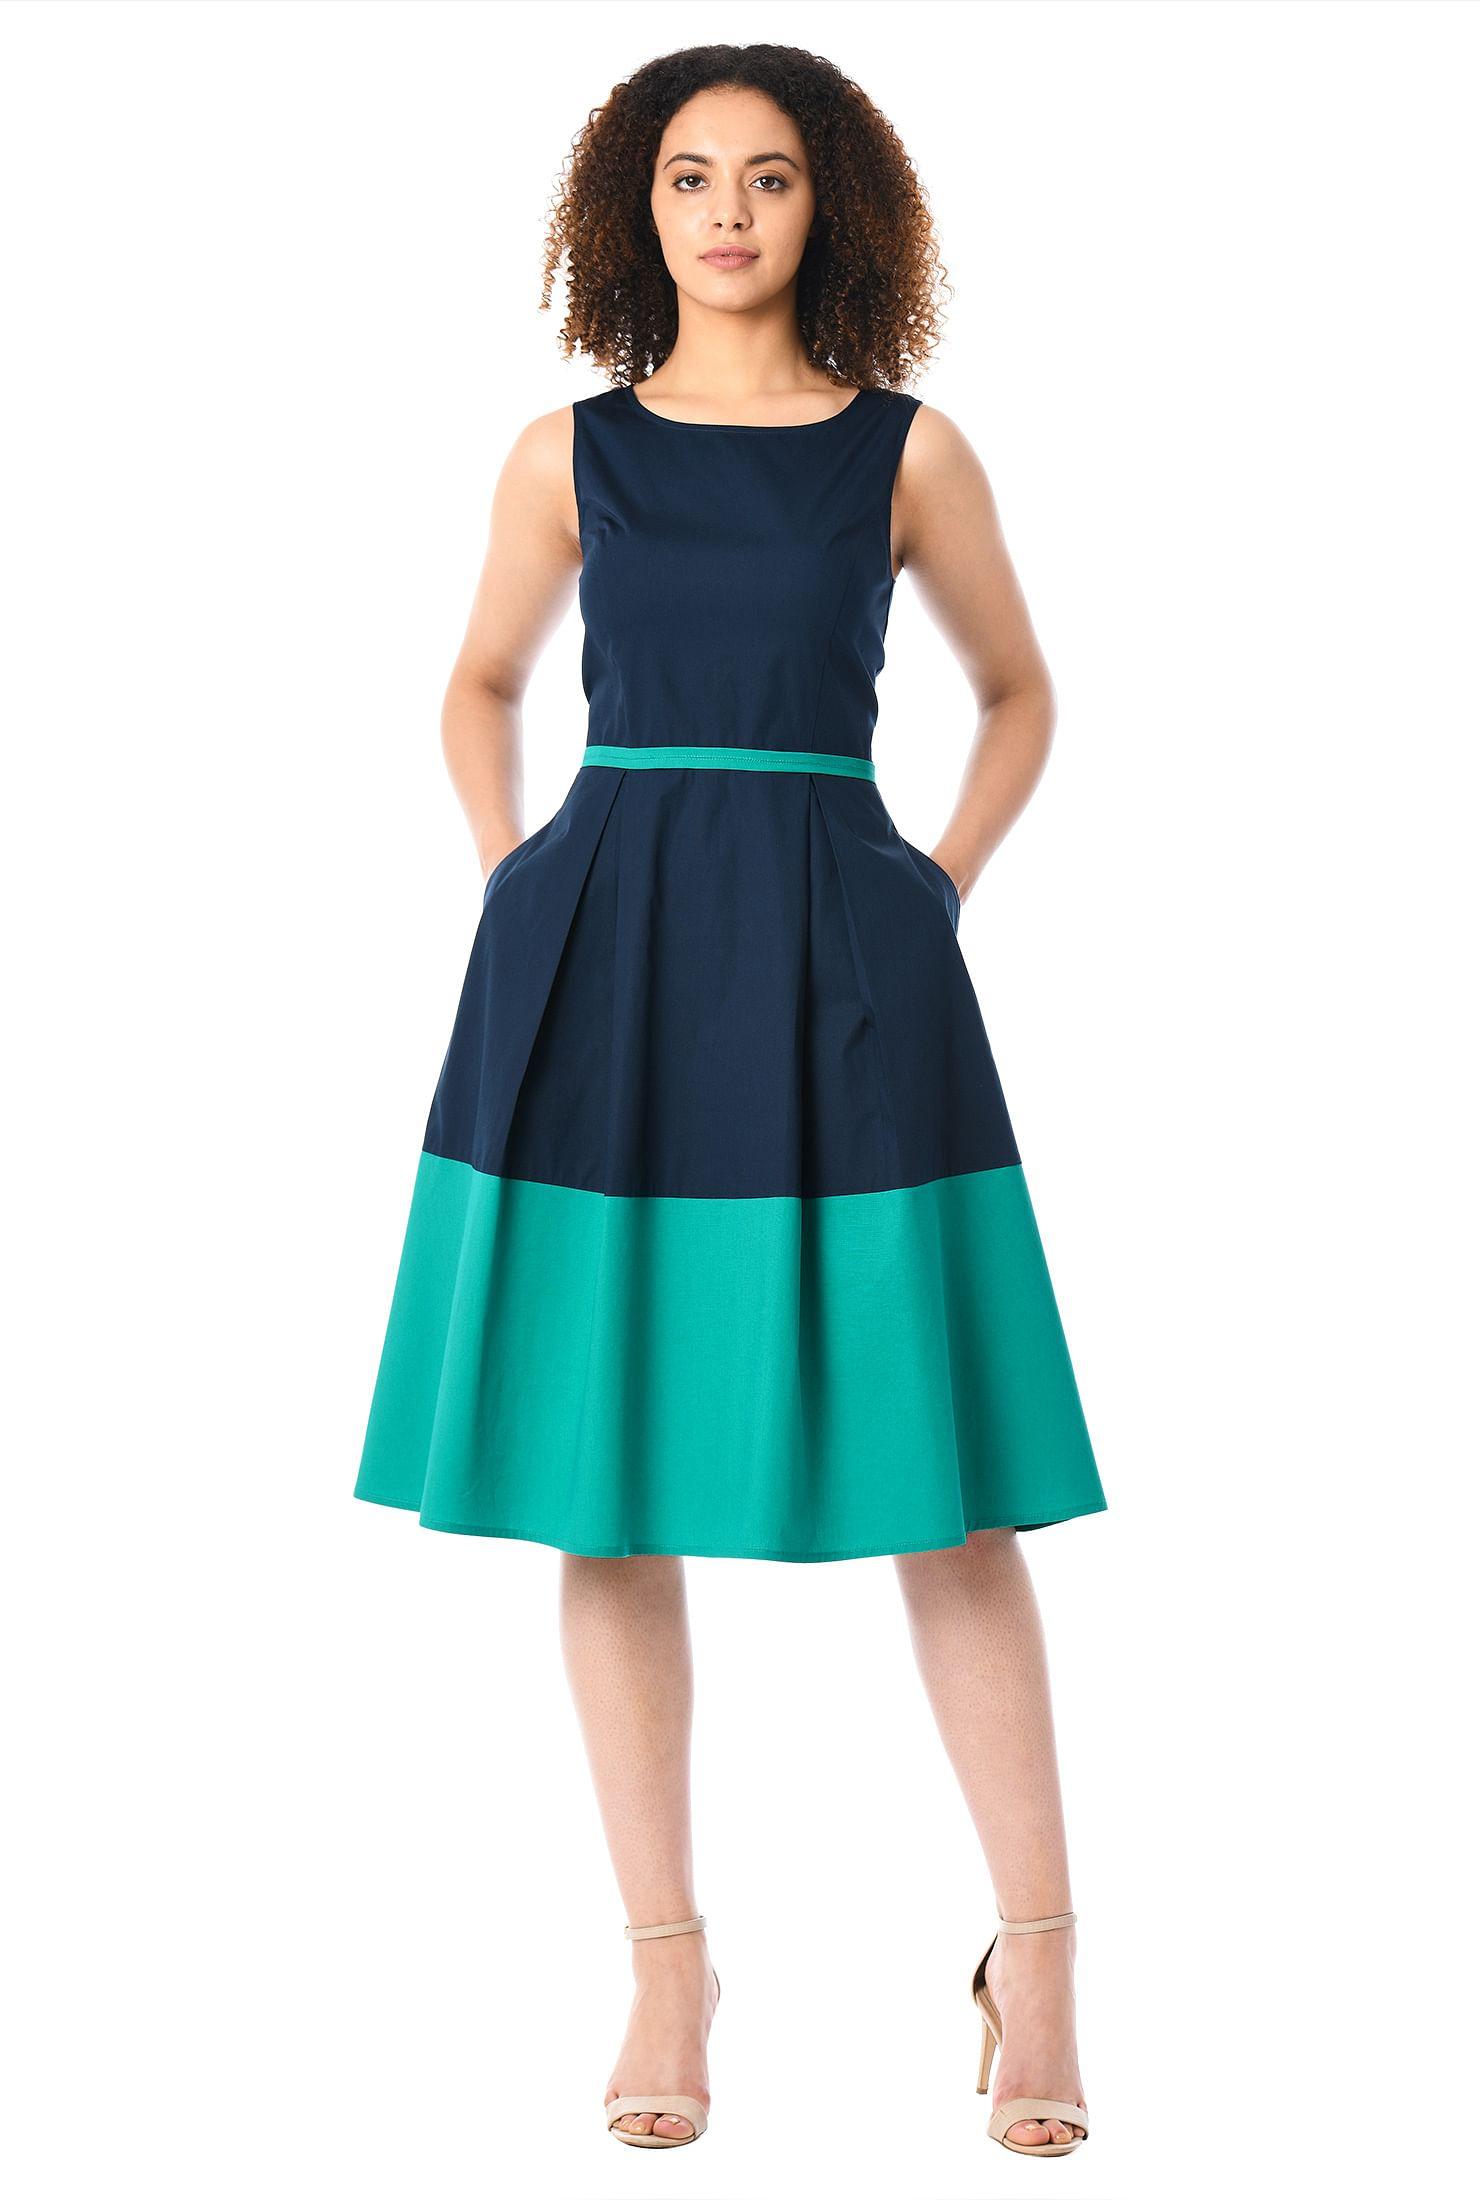 73bf5208d09 below knee length dresses, Colorblock Dresses, cotton poplin dresses, Deep  navy/